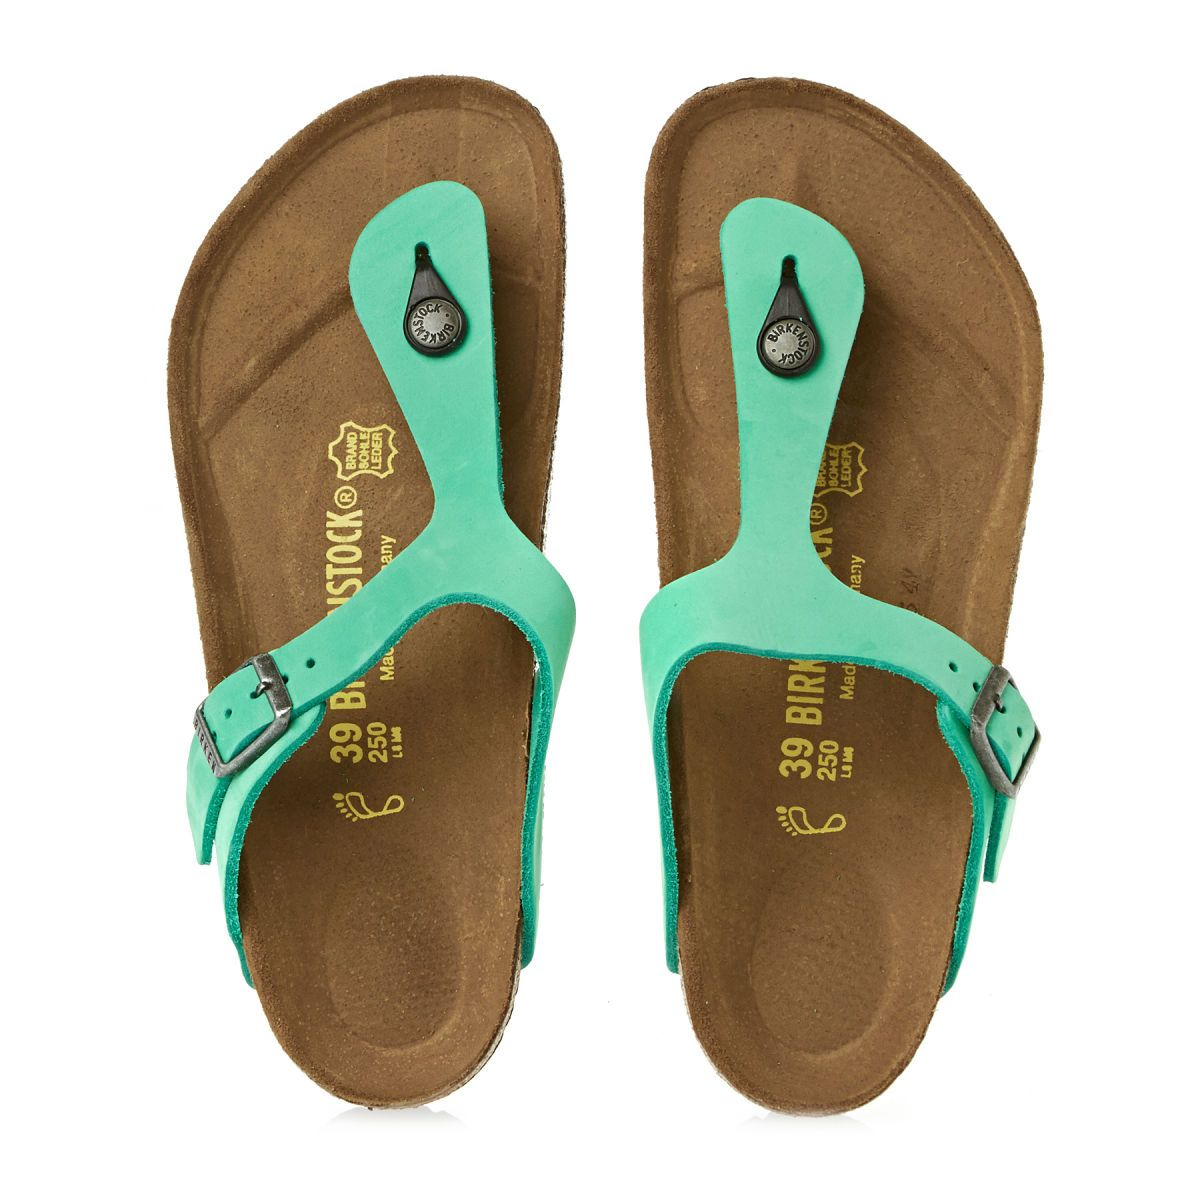 brand new 03c6c c41ec Birkenstock Gizeh Nubuck Sandals - Mint | Free UK Delivery ...